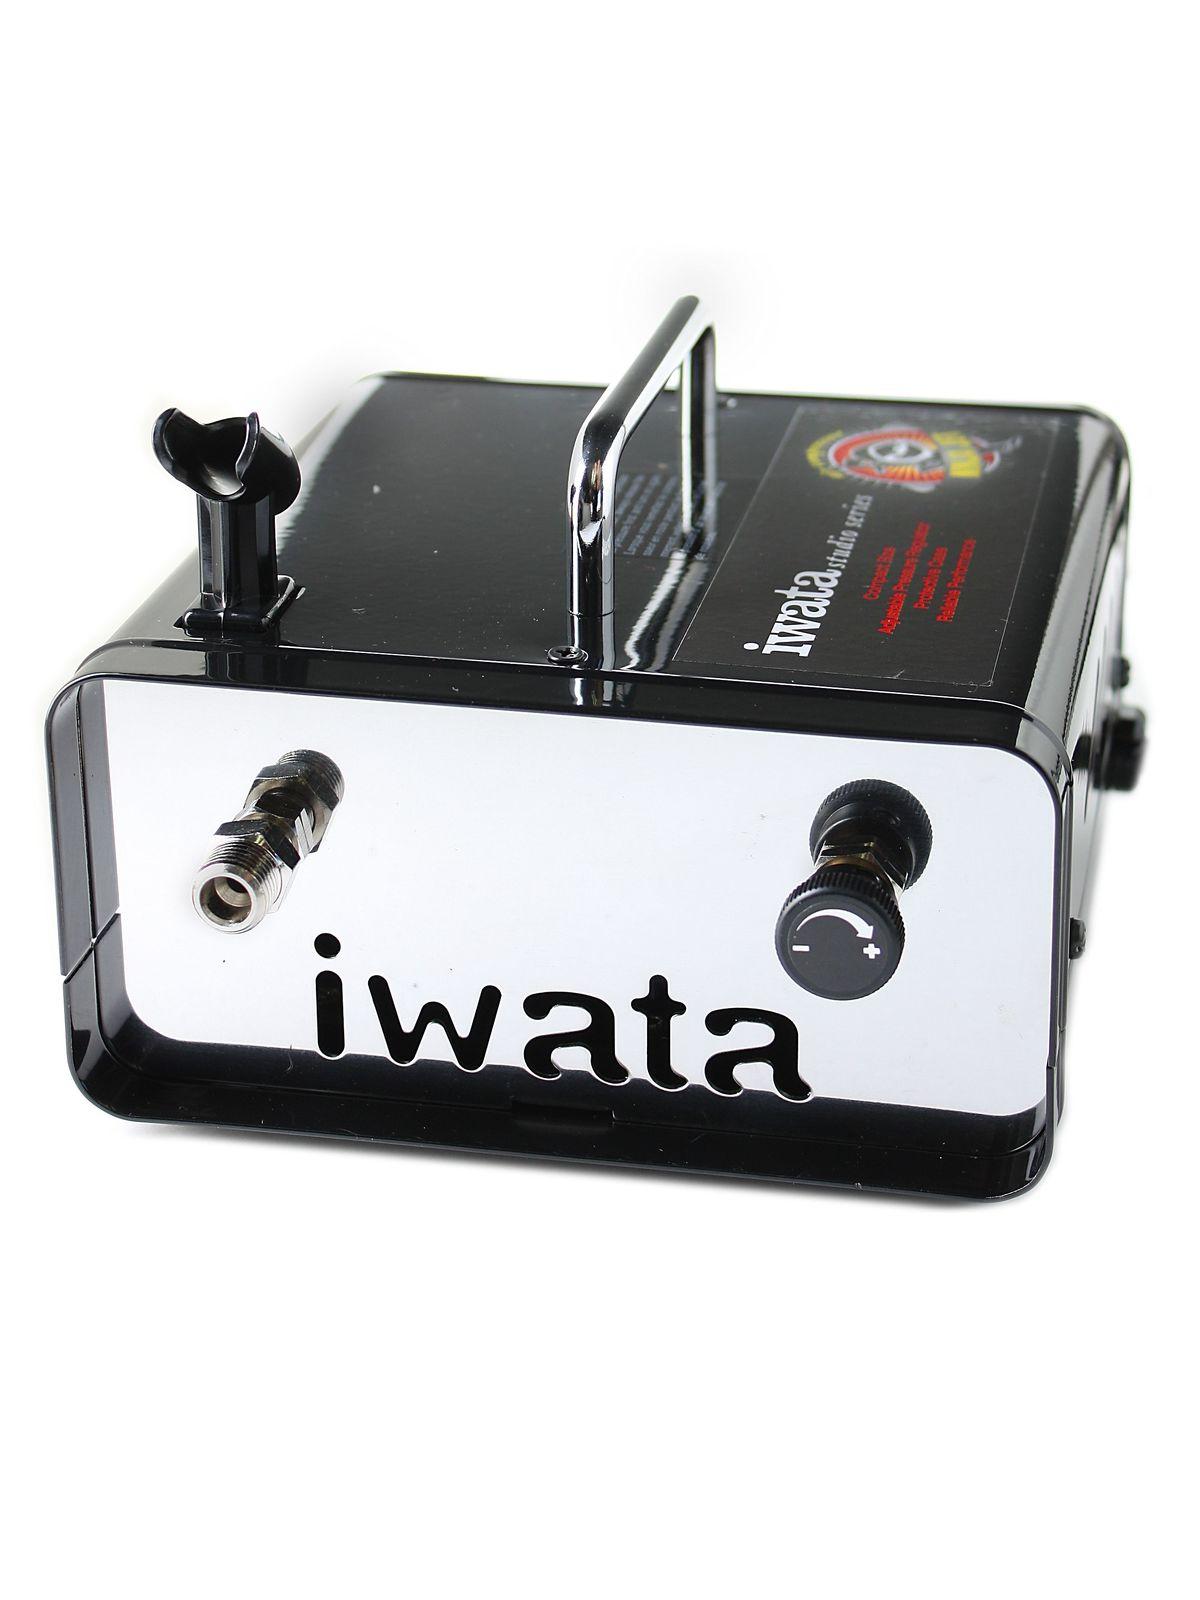 Iwata - Ninja Jet air compressor